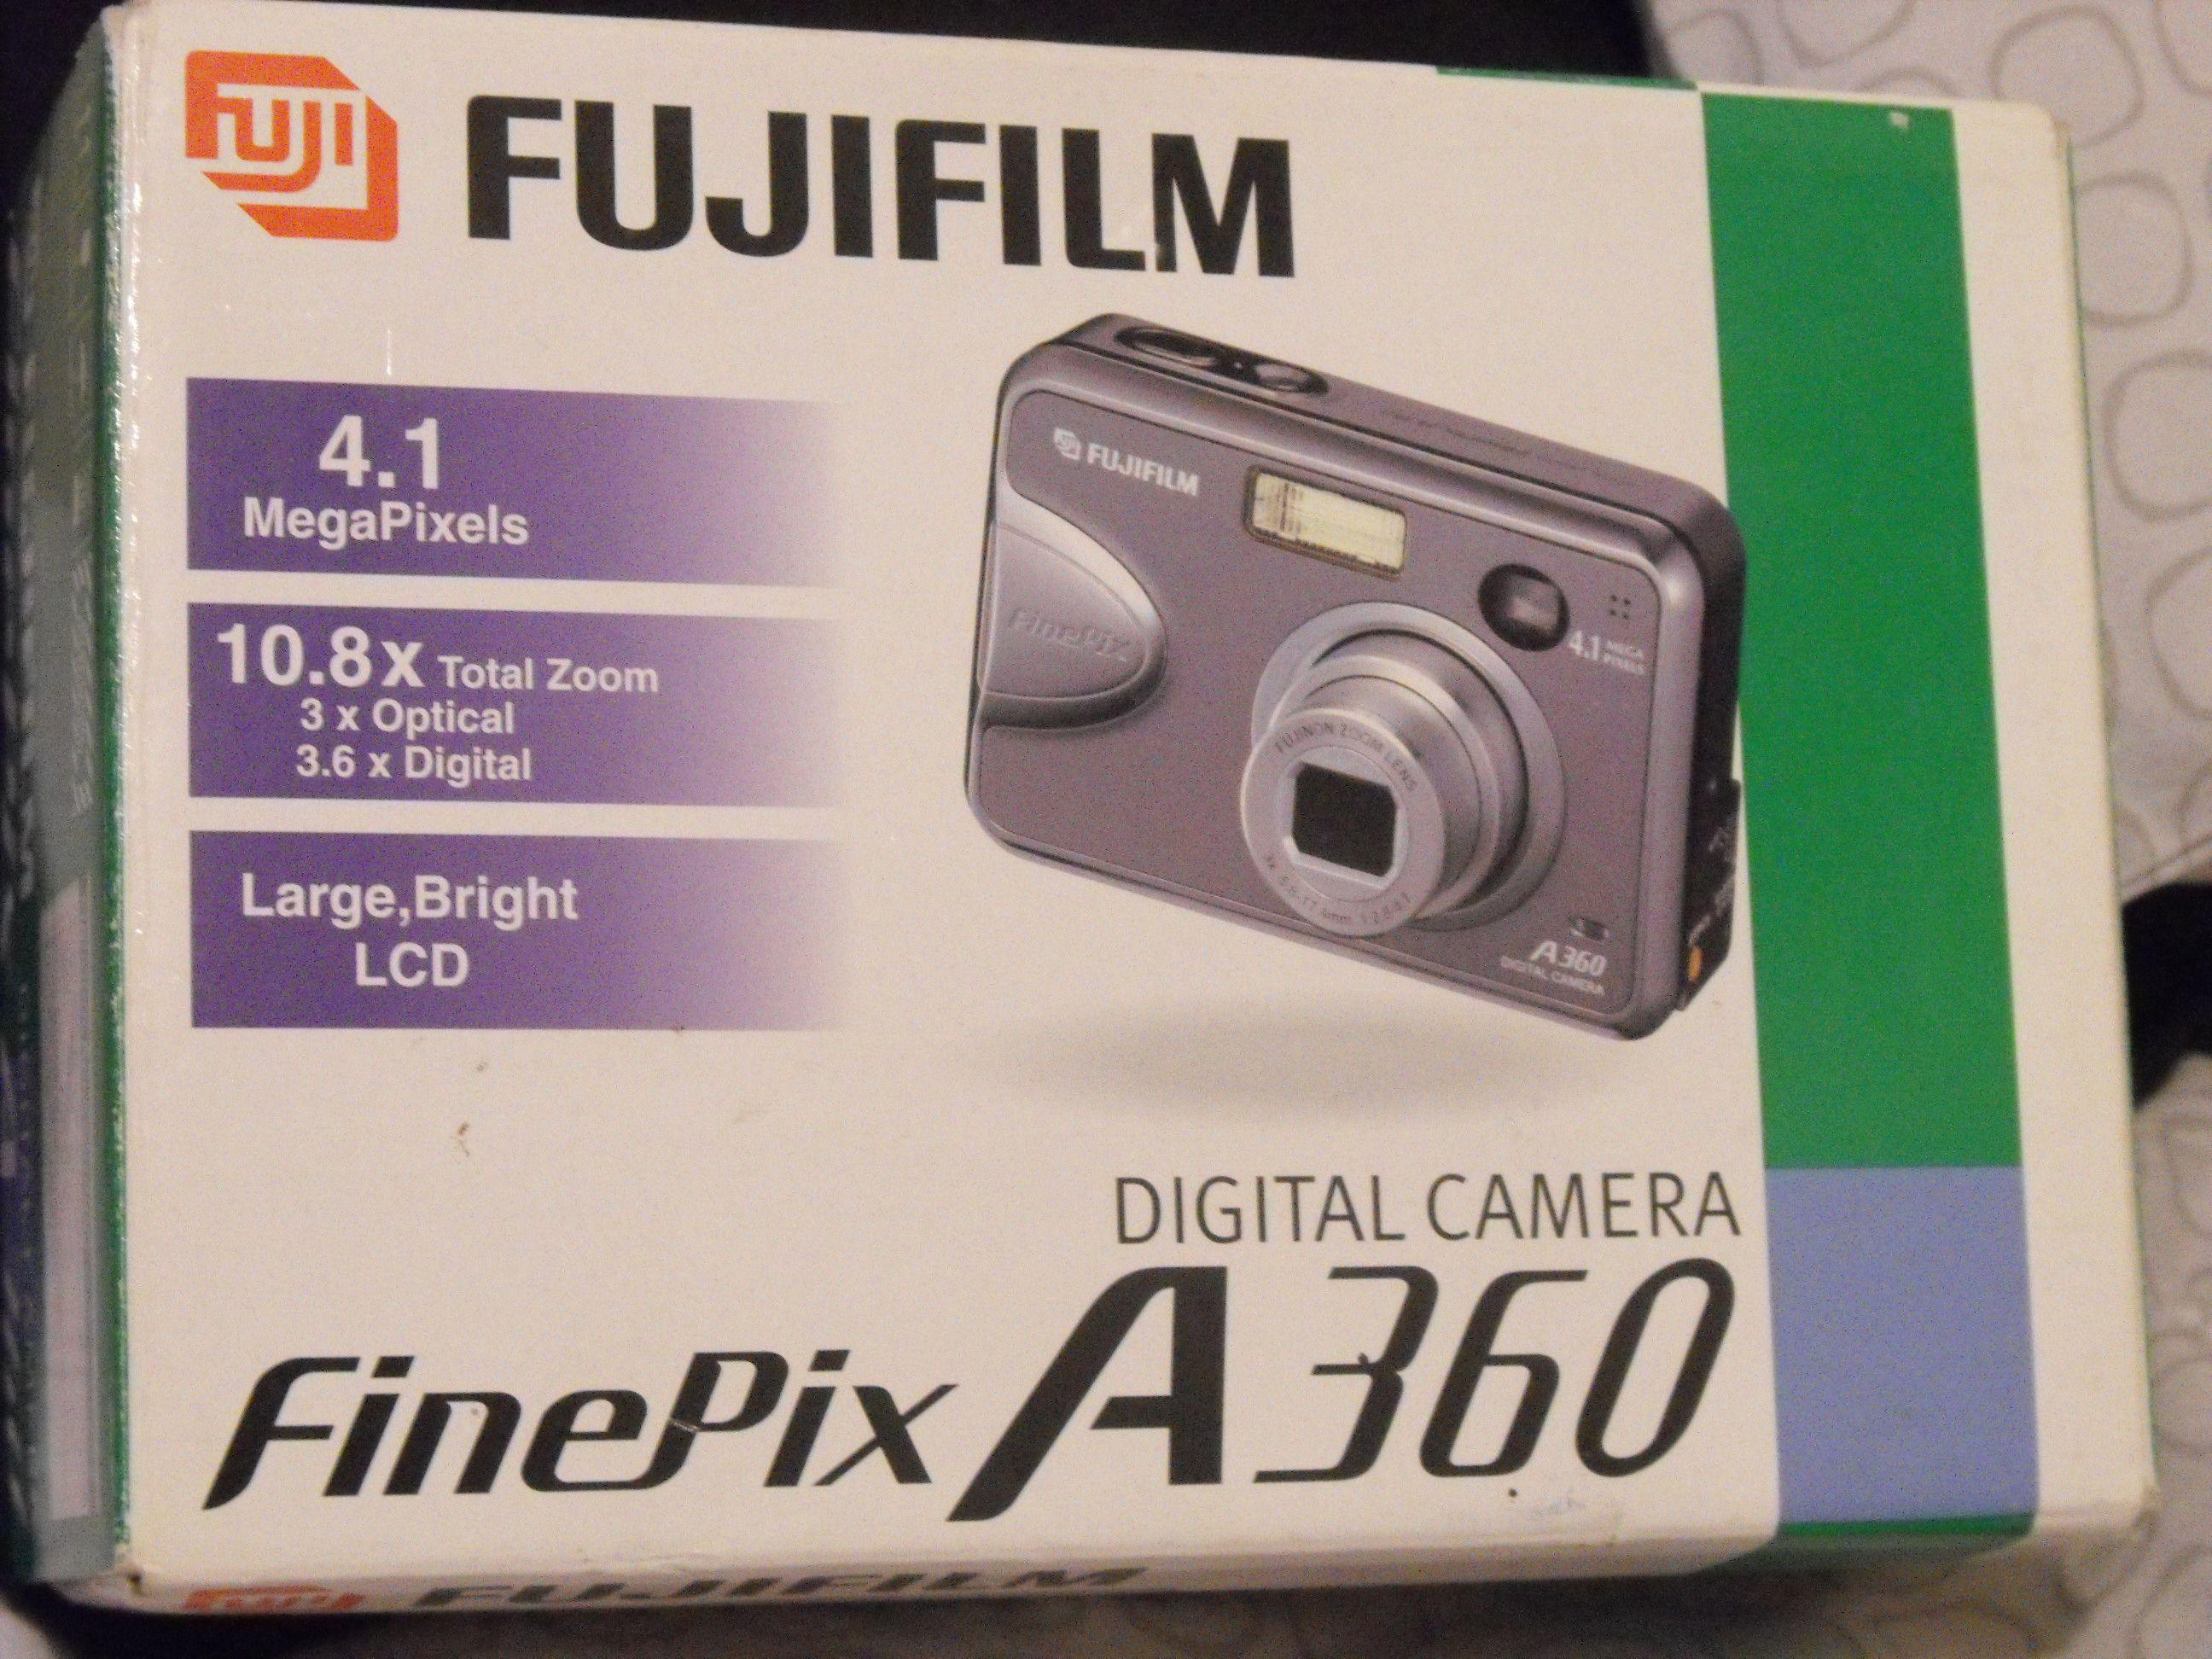 07c862d92b18797ed23b0a3b5c094935 - How To Get A New Camera Card In Pa